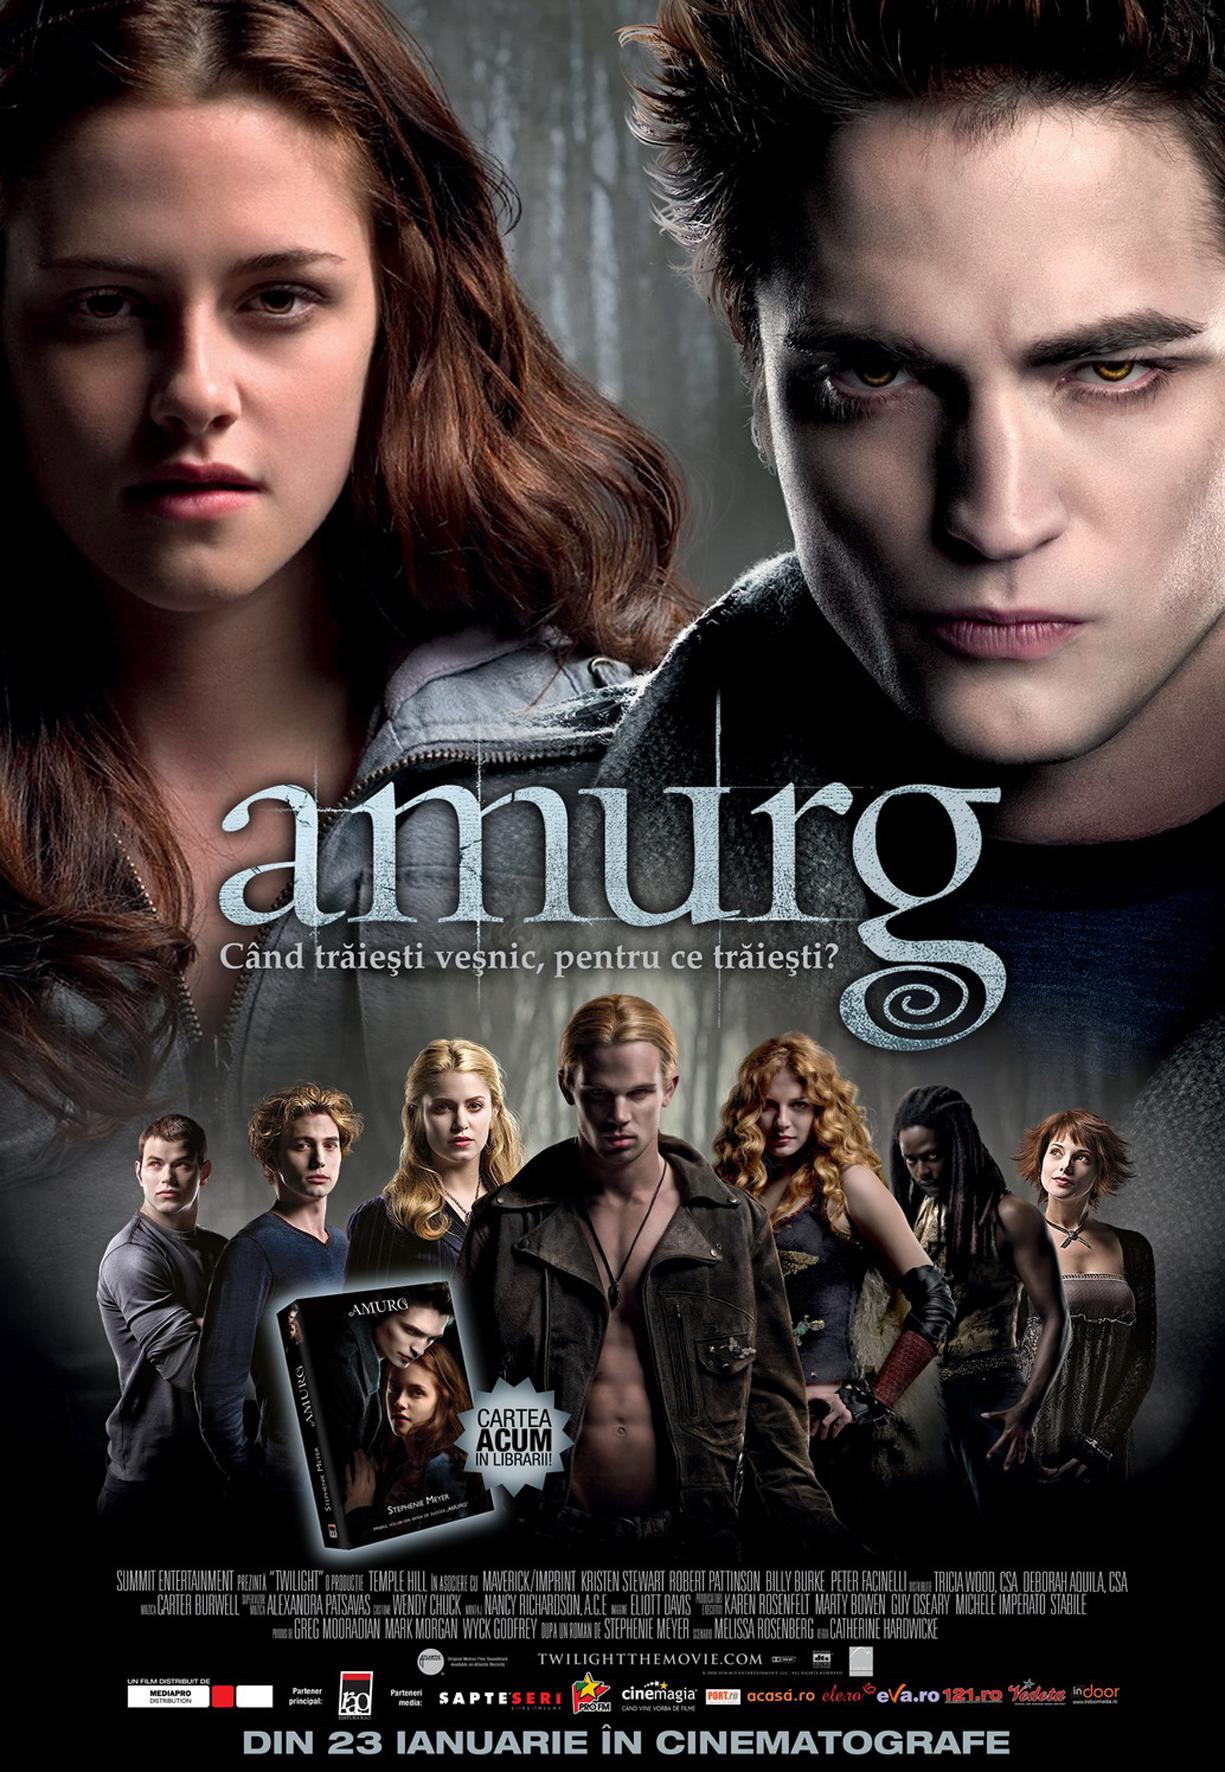 Twilight 1 Online Subtitrat